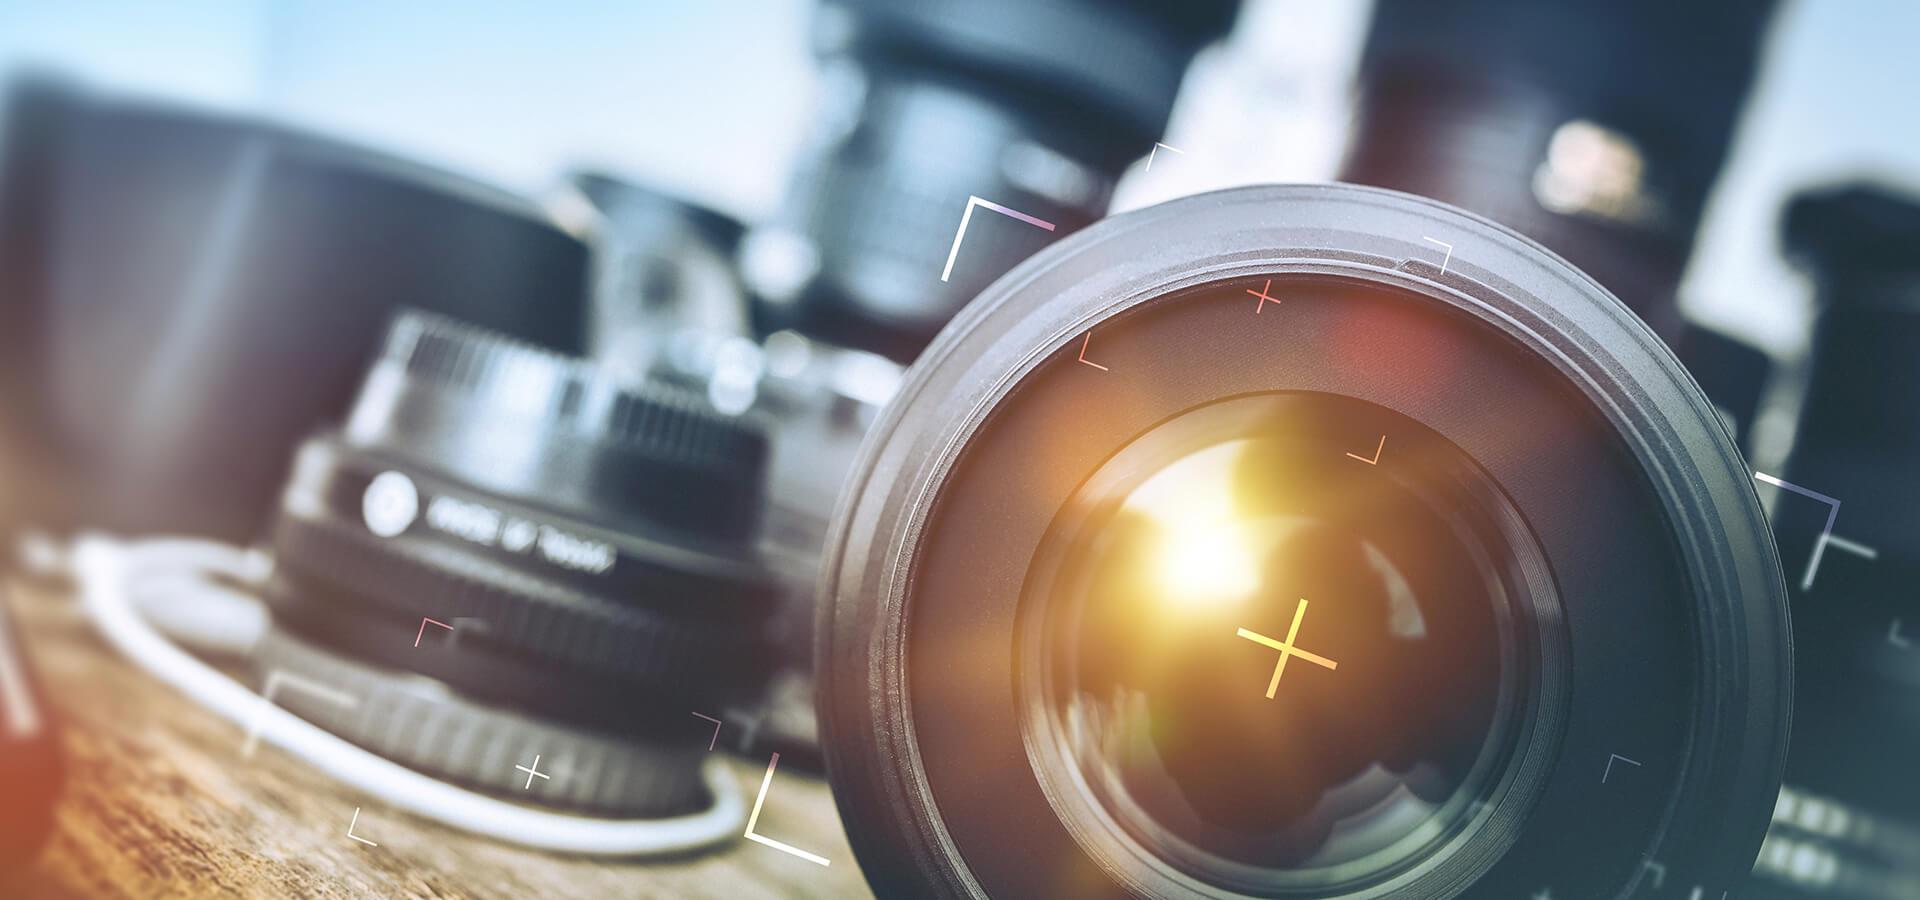 Imagine cameraman